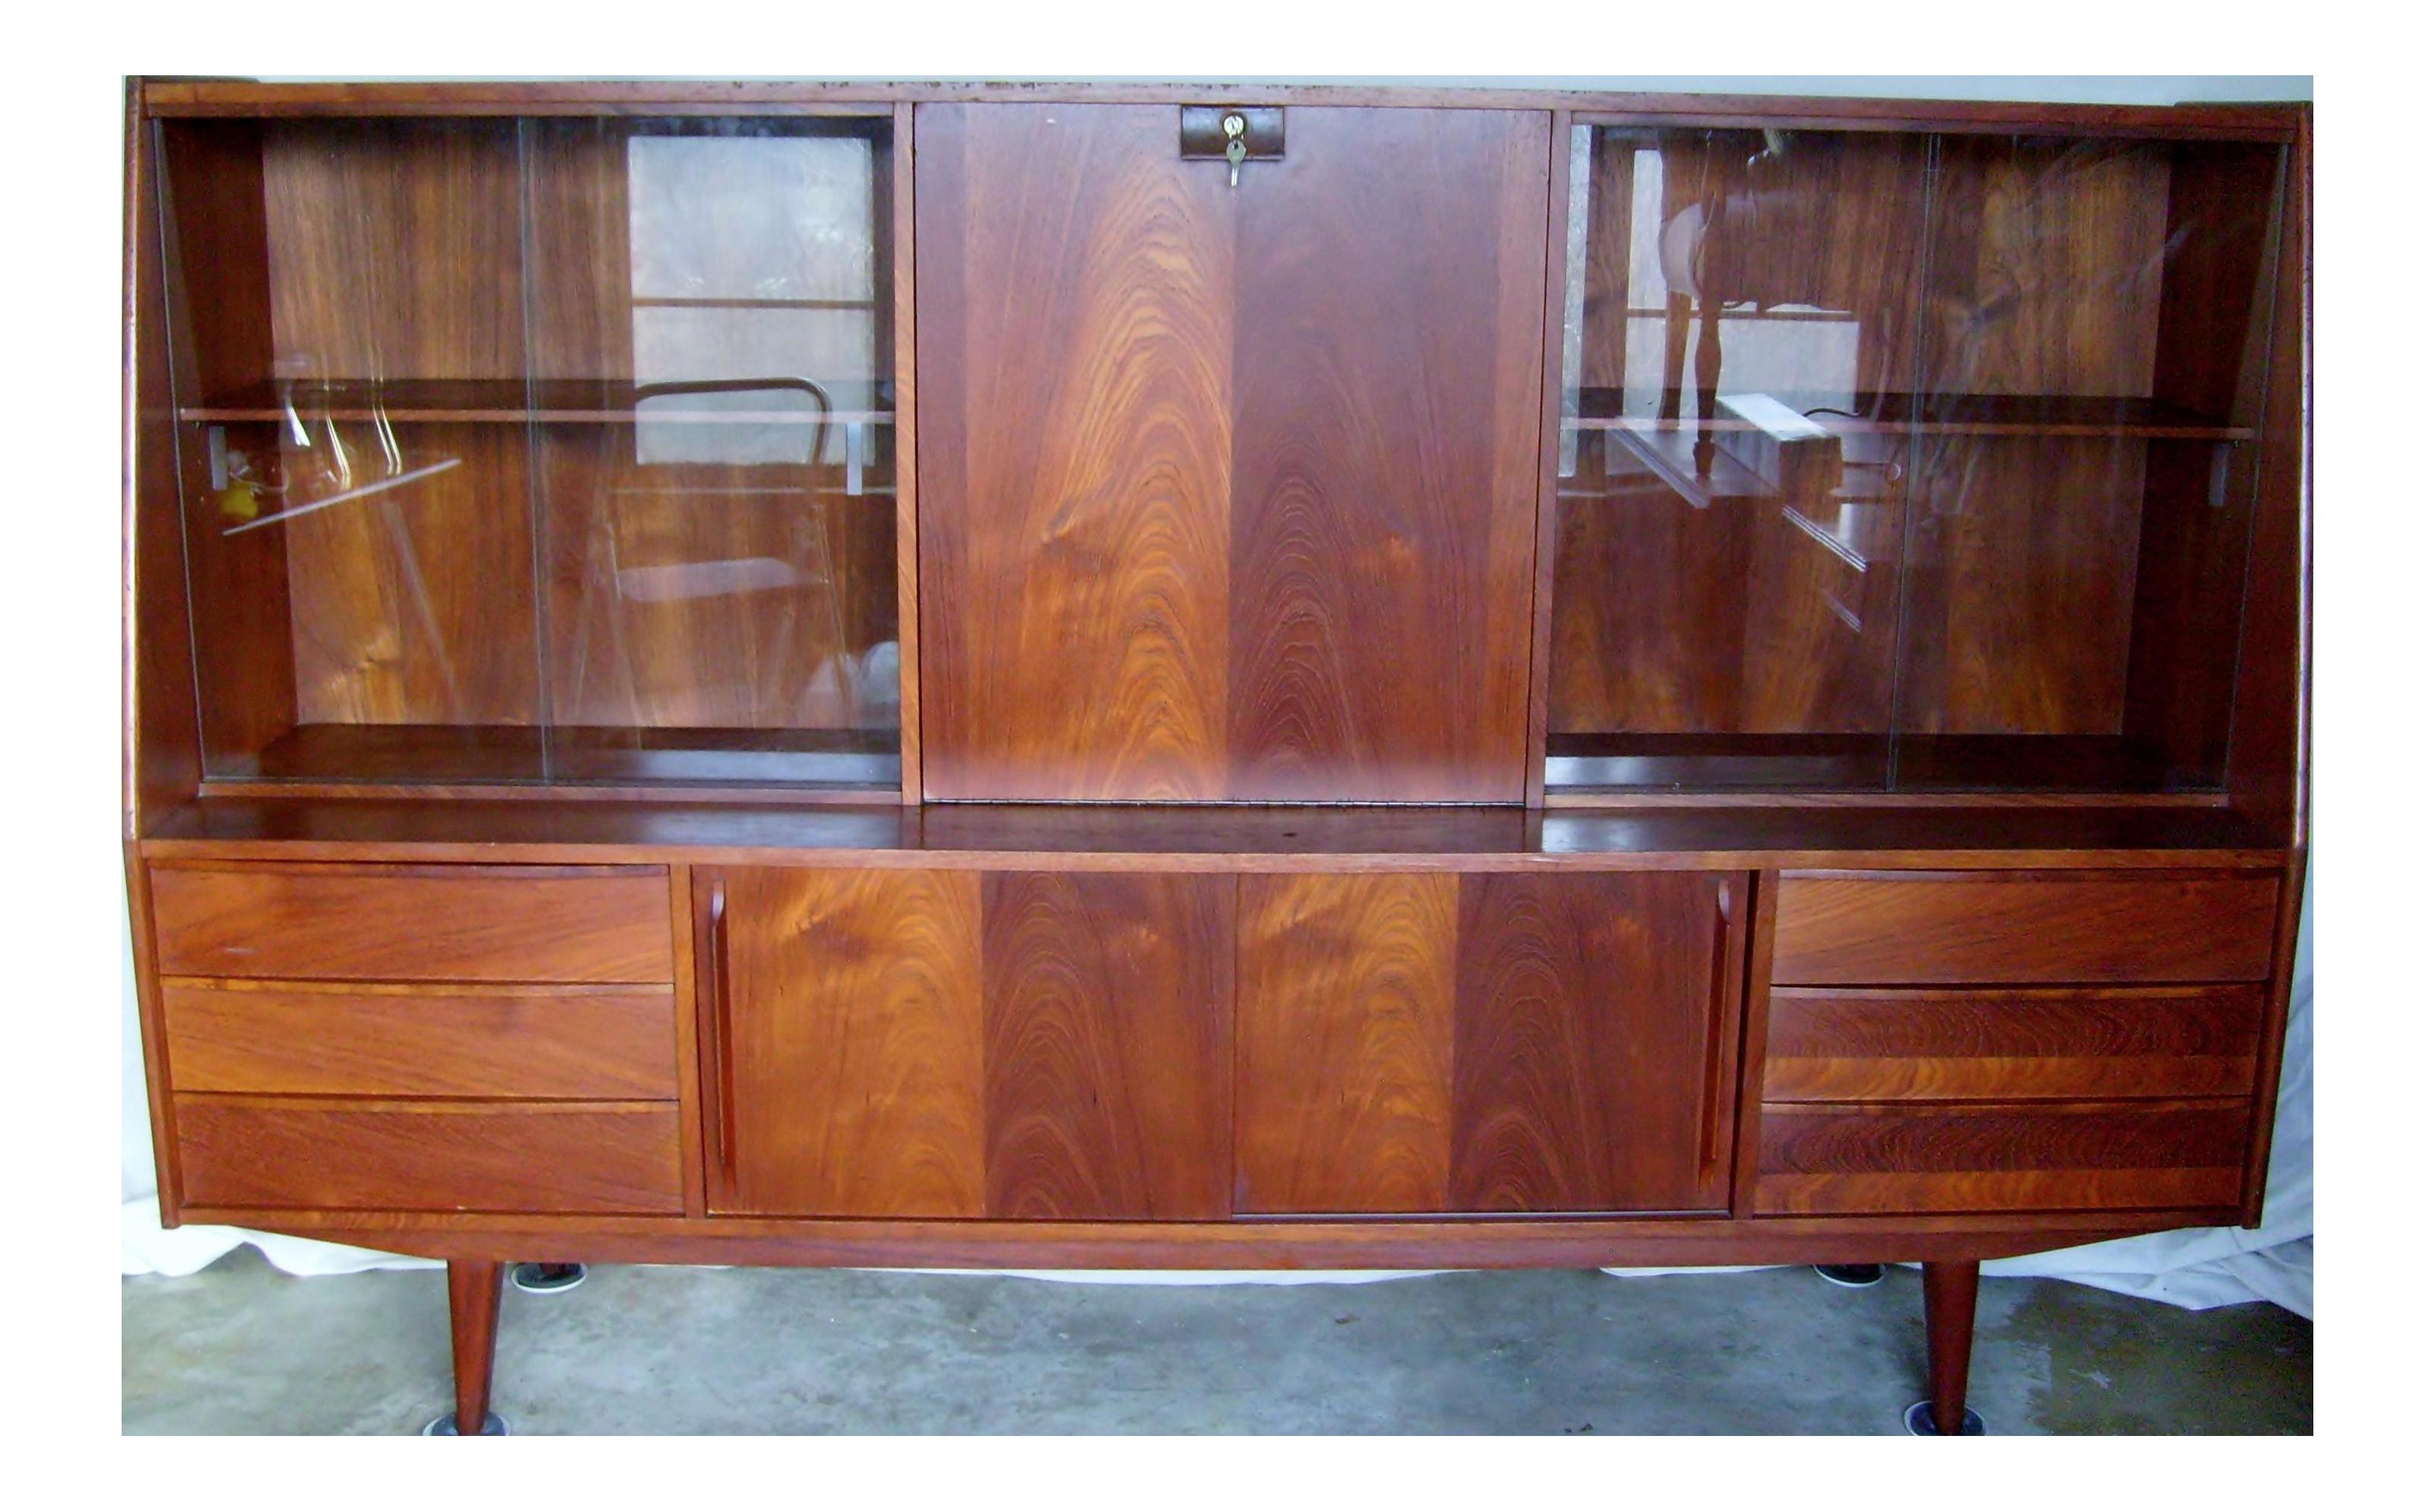 Danish Credenza Hutch : 7 ft. mid century danish modern teak credenza dry bar hutch chairish